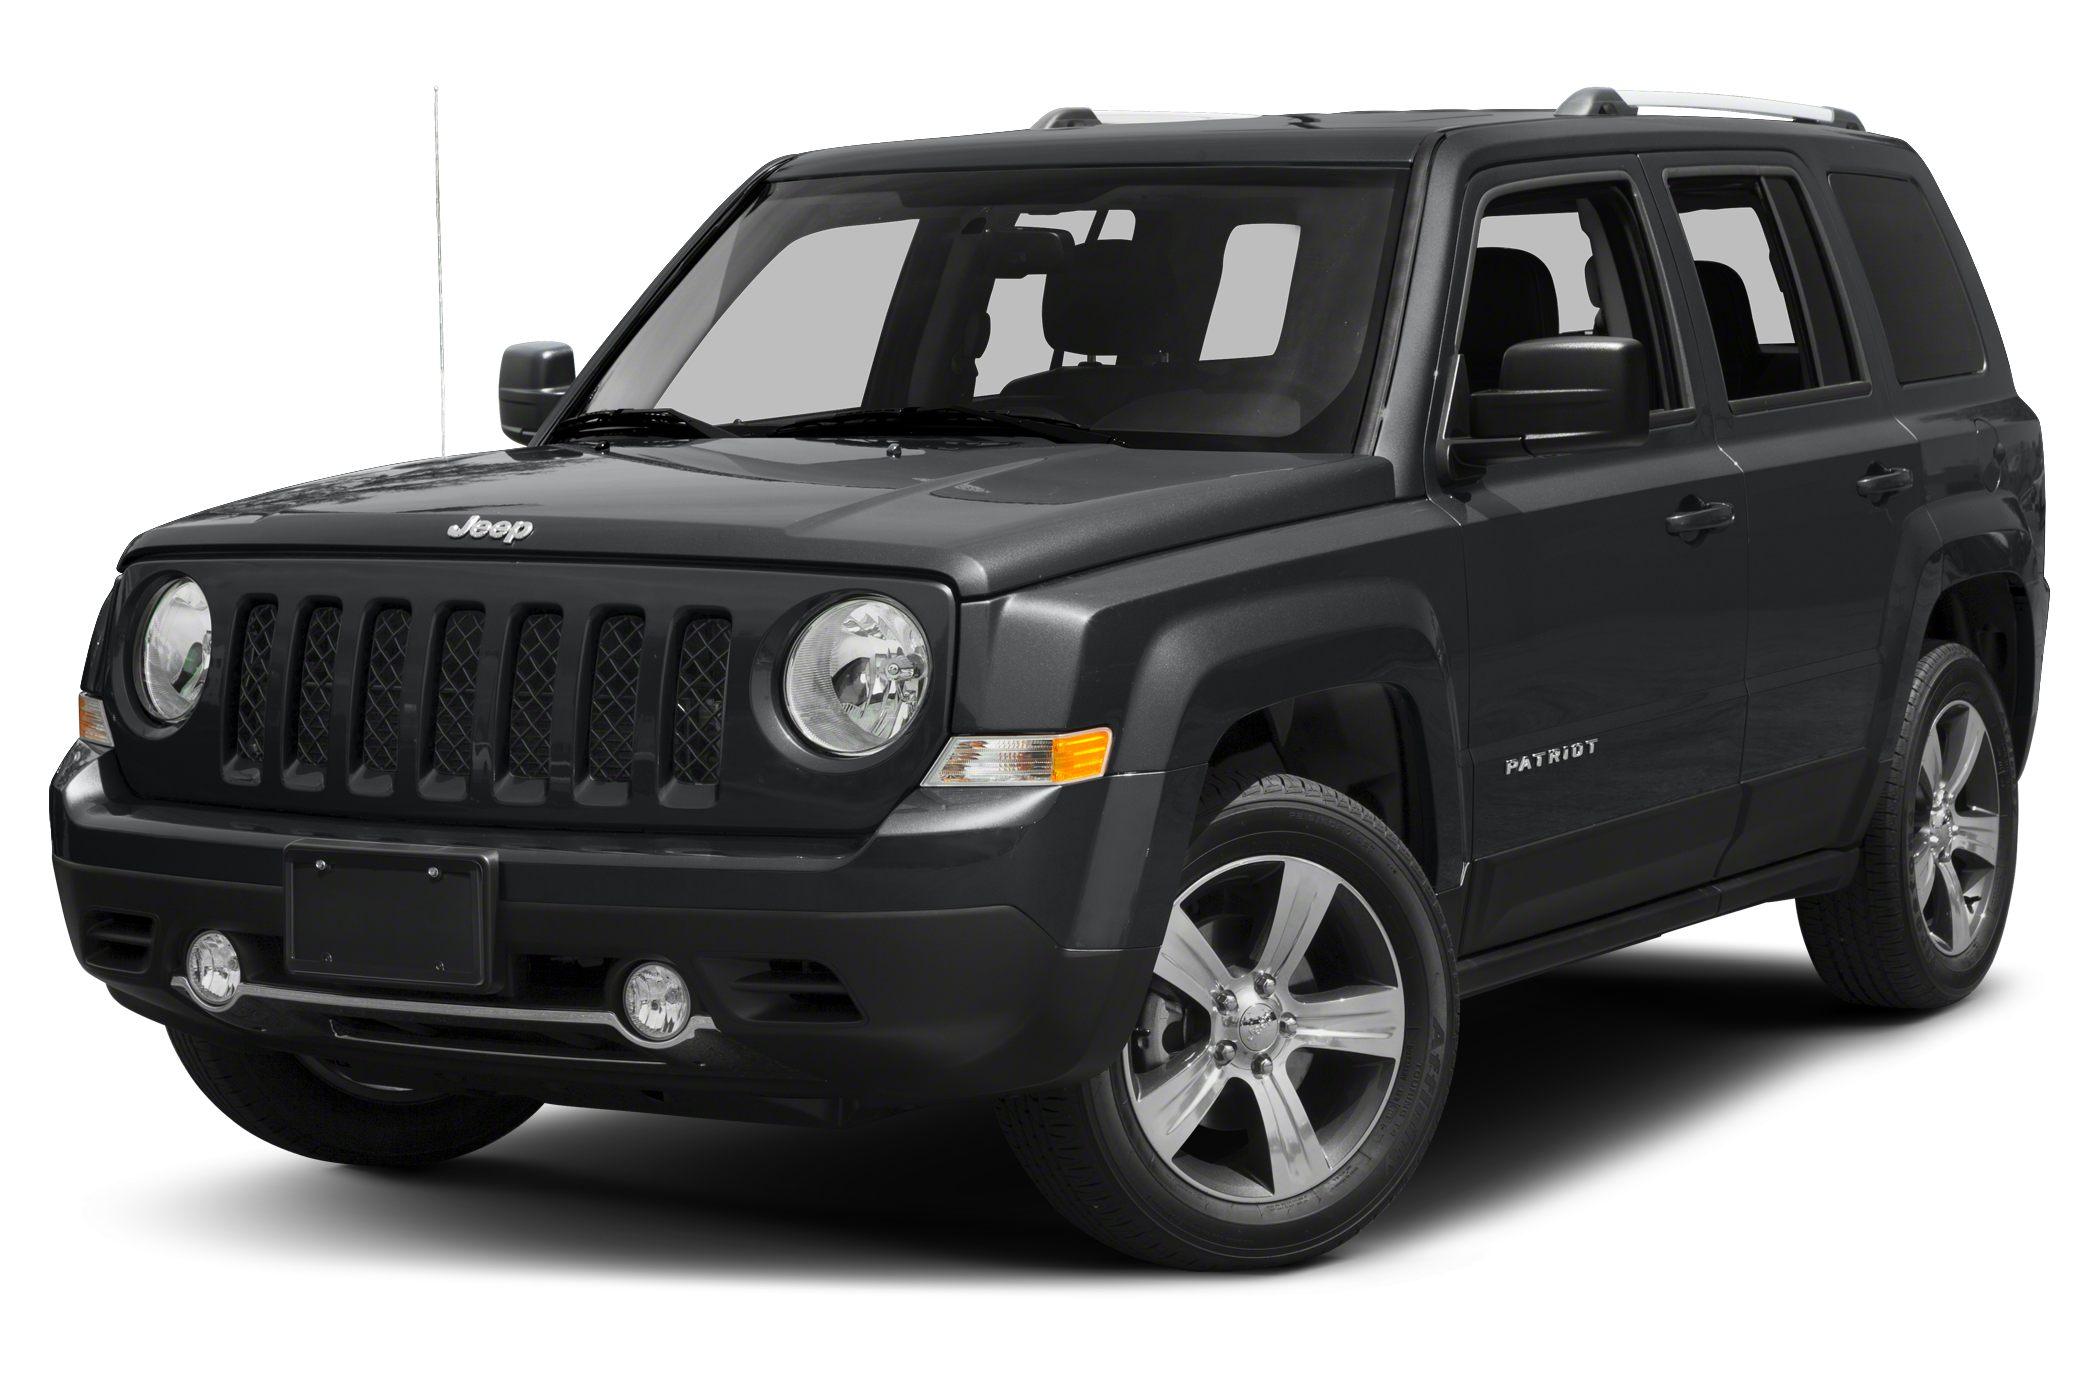 2017 Jeep Patriot Reviews, Specs and Prices   Cars.com